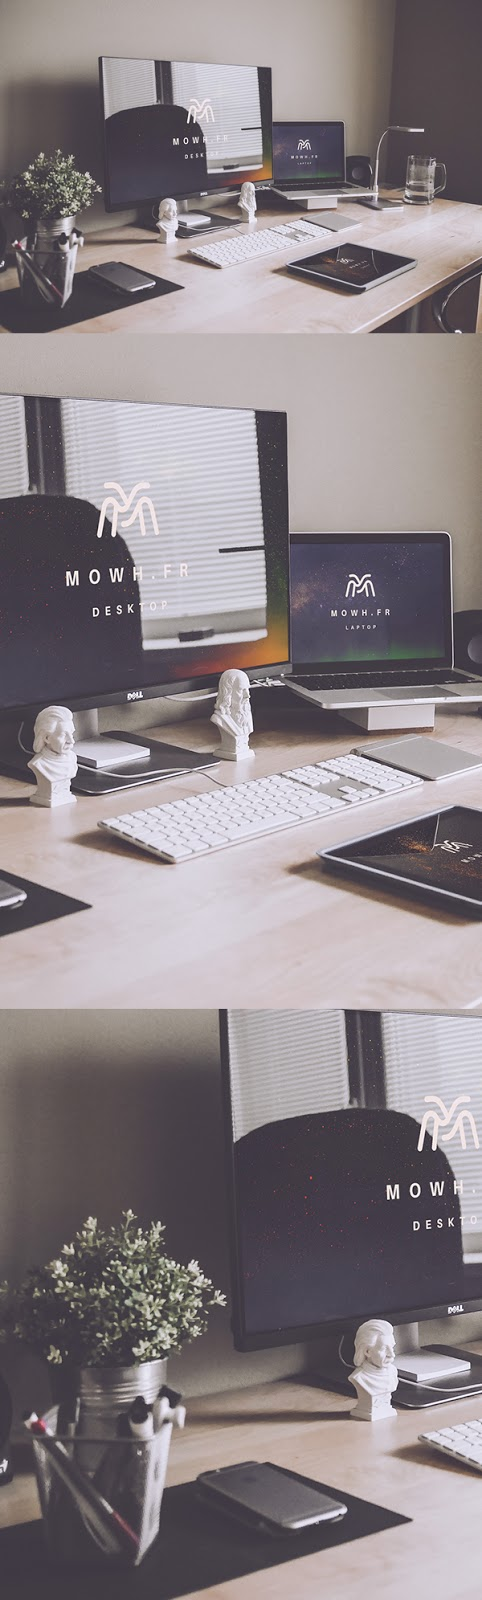 Download Free Mockup PSD 2018 - Free Devices (Dell monitor + Macbook + iPad) Mockup Templates